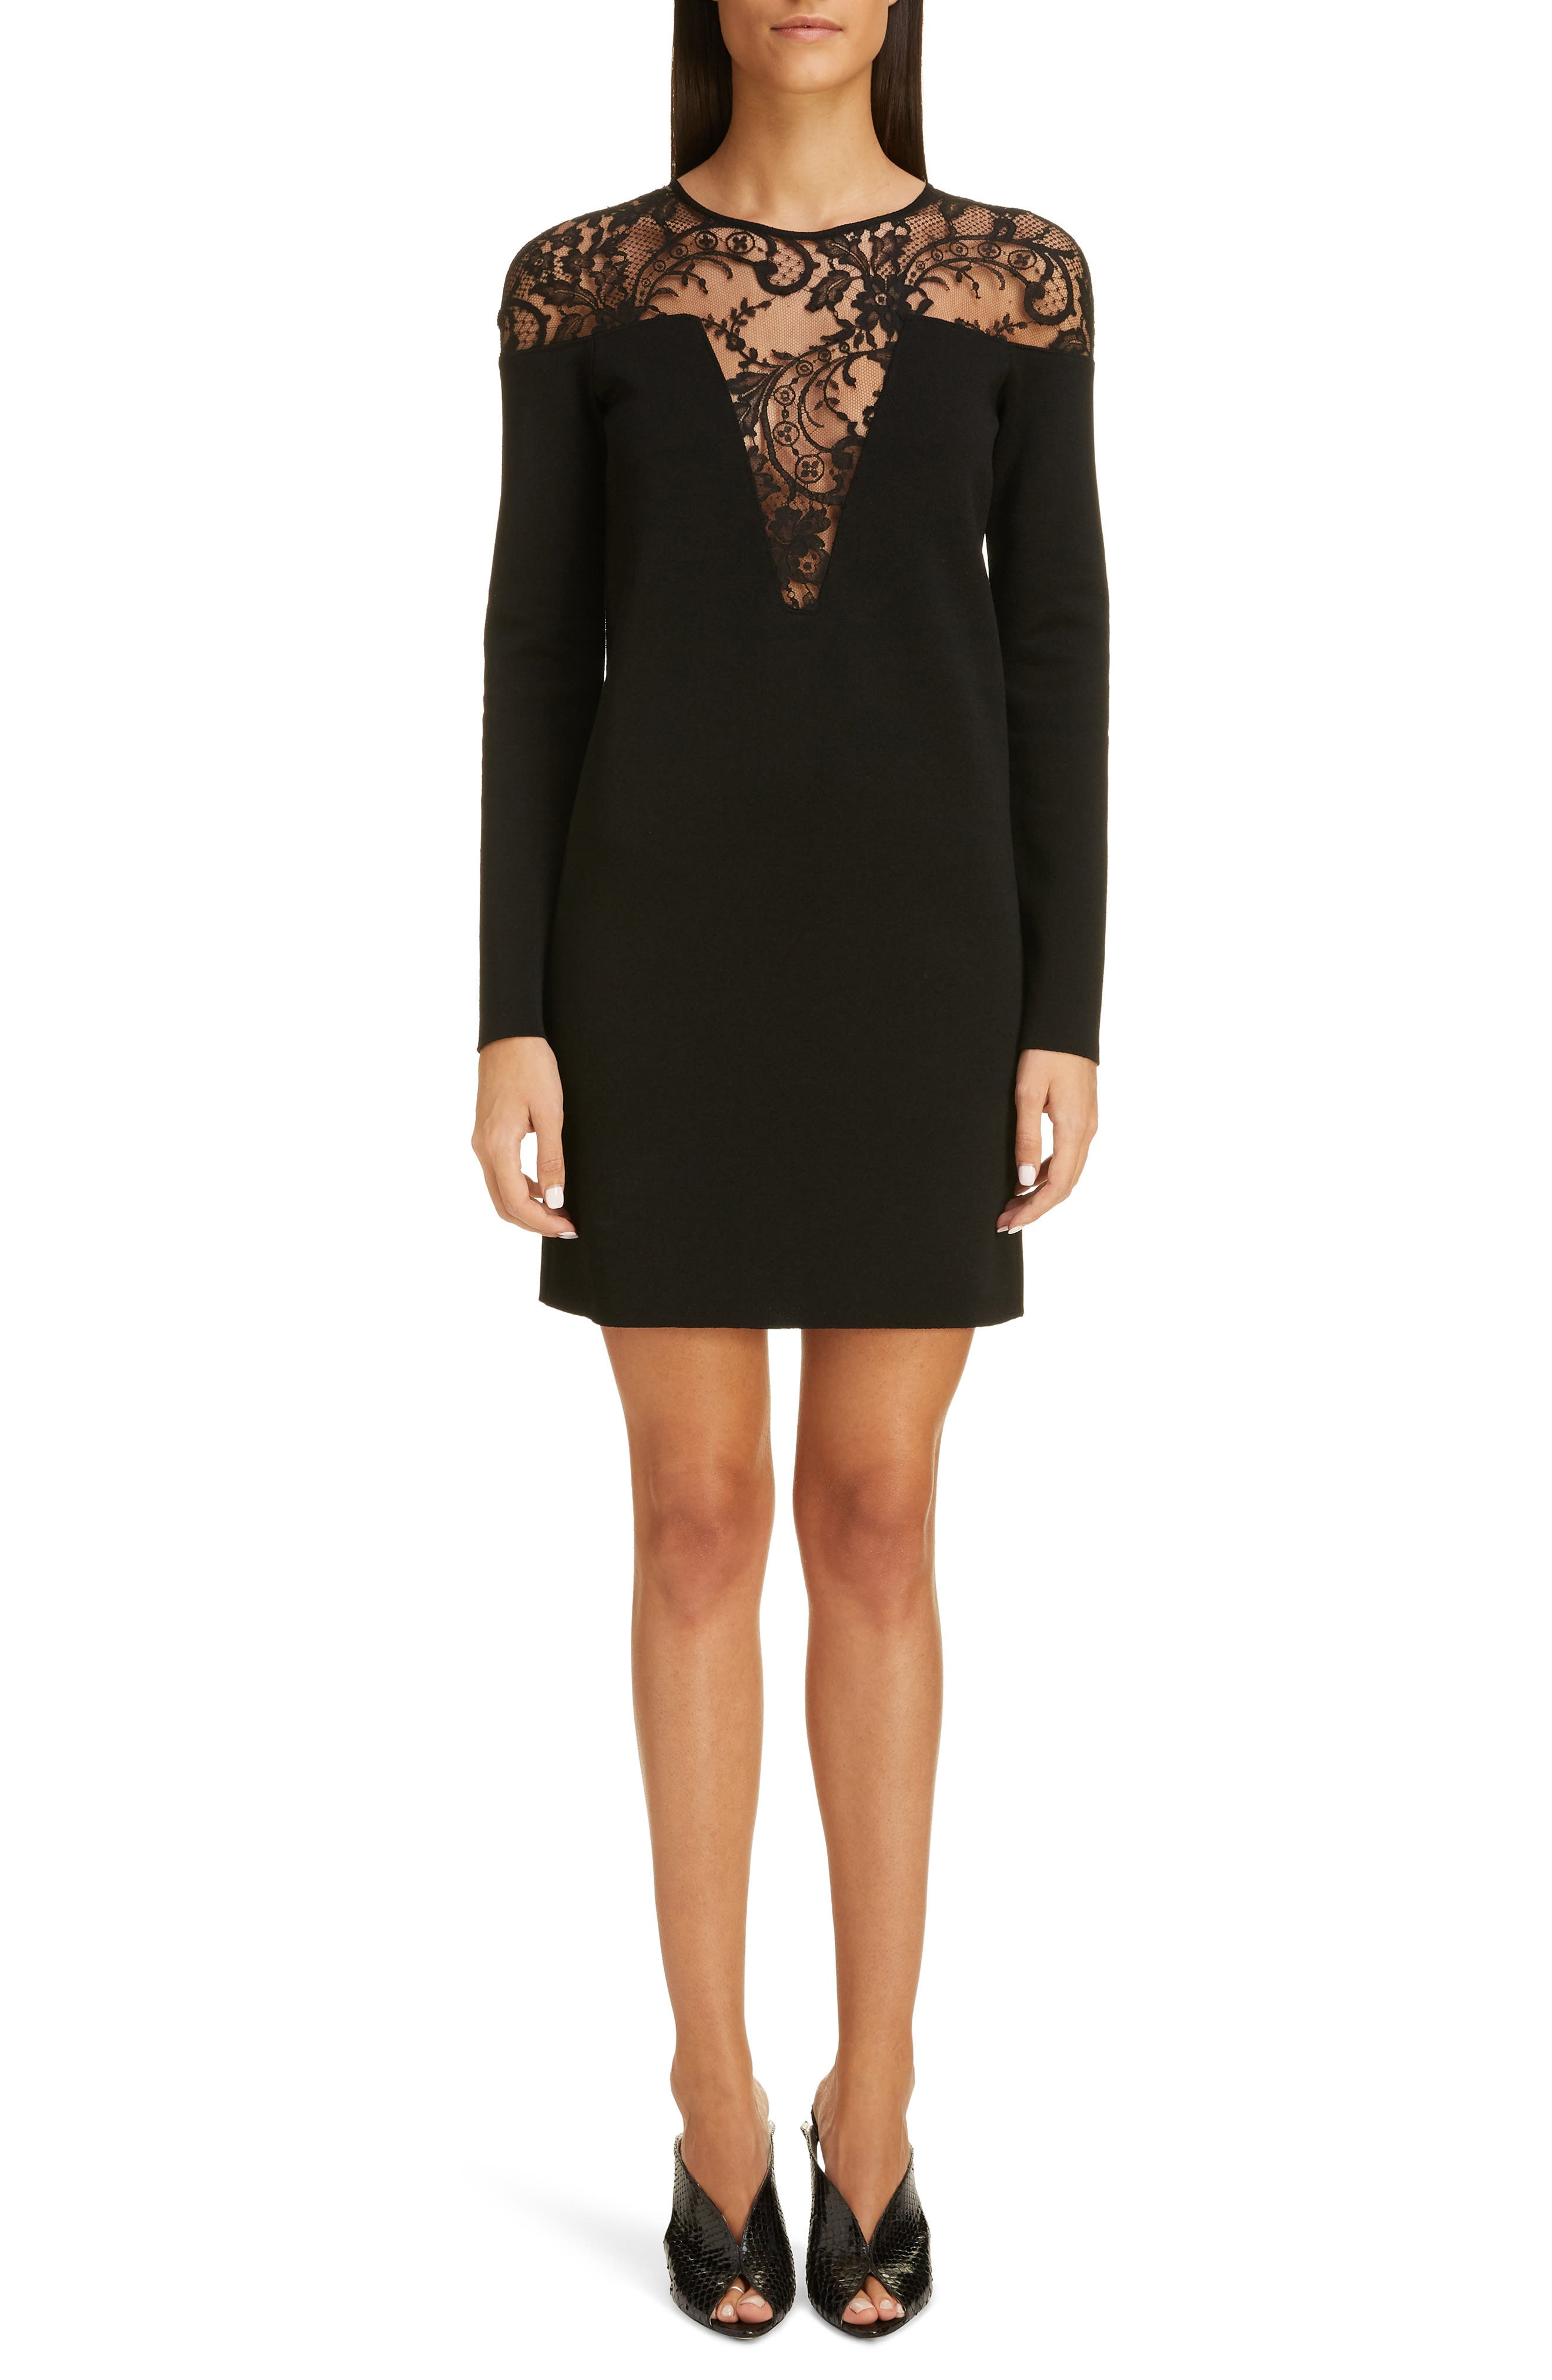 Givenchy Illusion Lace Neck Long Sleeve Dress, Black